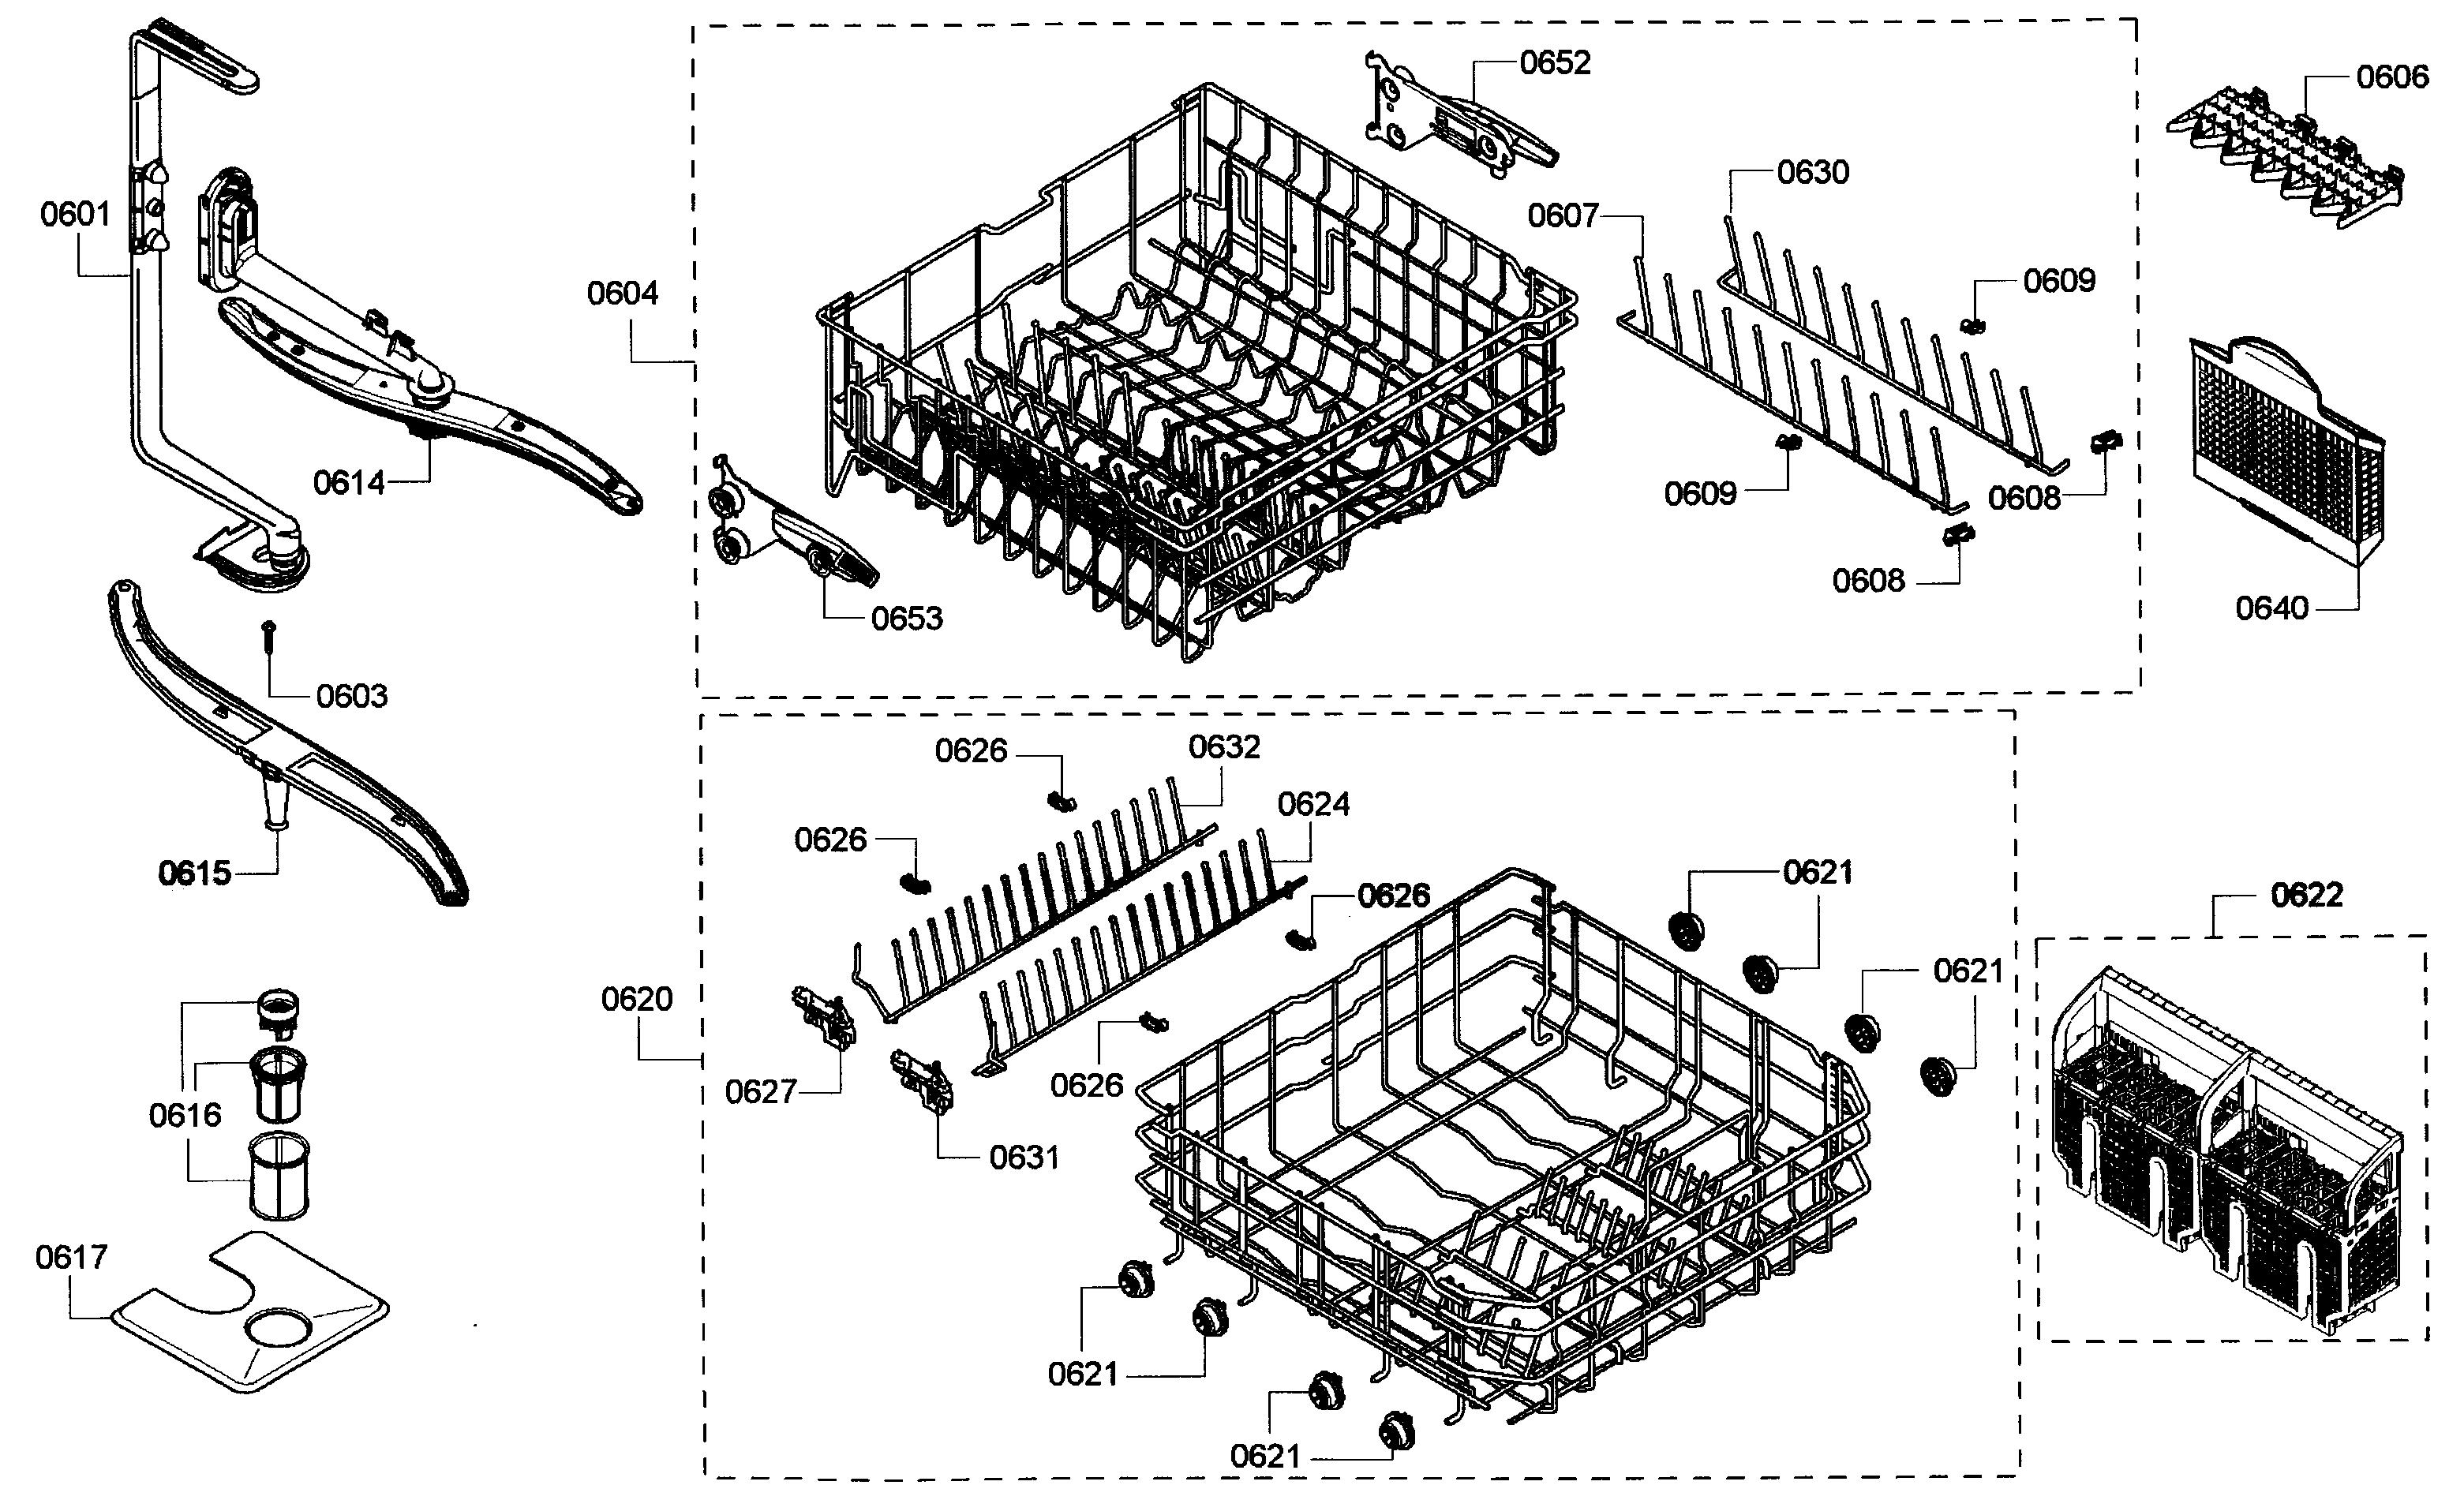 Kenmore Dishwasher Schematic Pictures to Pin PinsDaddy – Kenmore Elite Dishwasher Model 465 3333600 Wiring-diagram